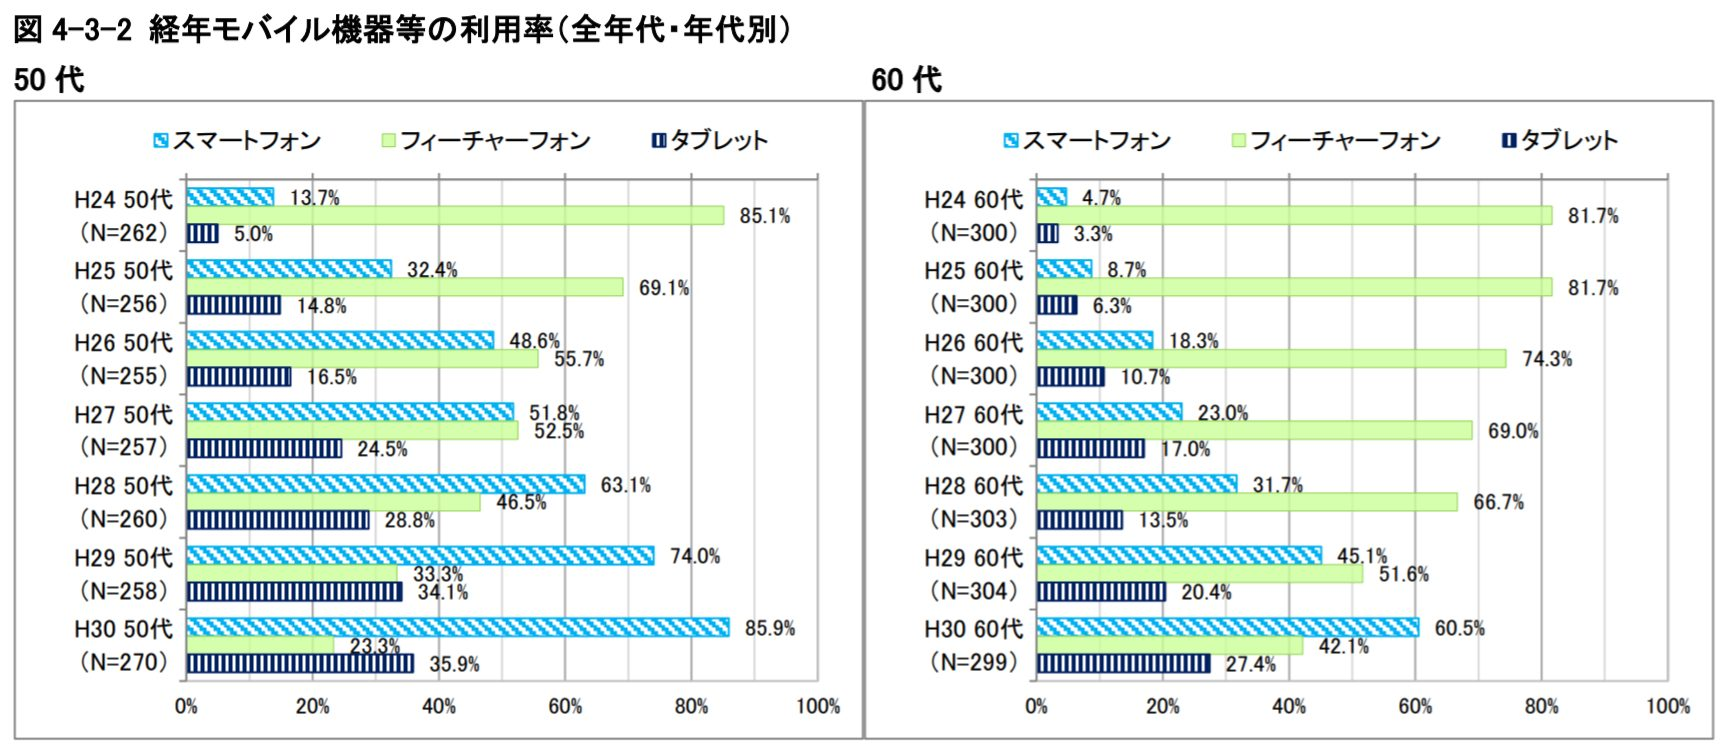 elderly-mobile-statistics